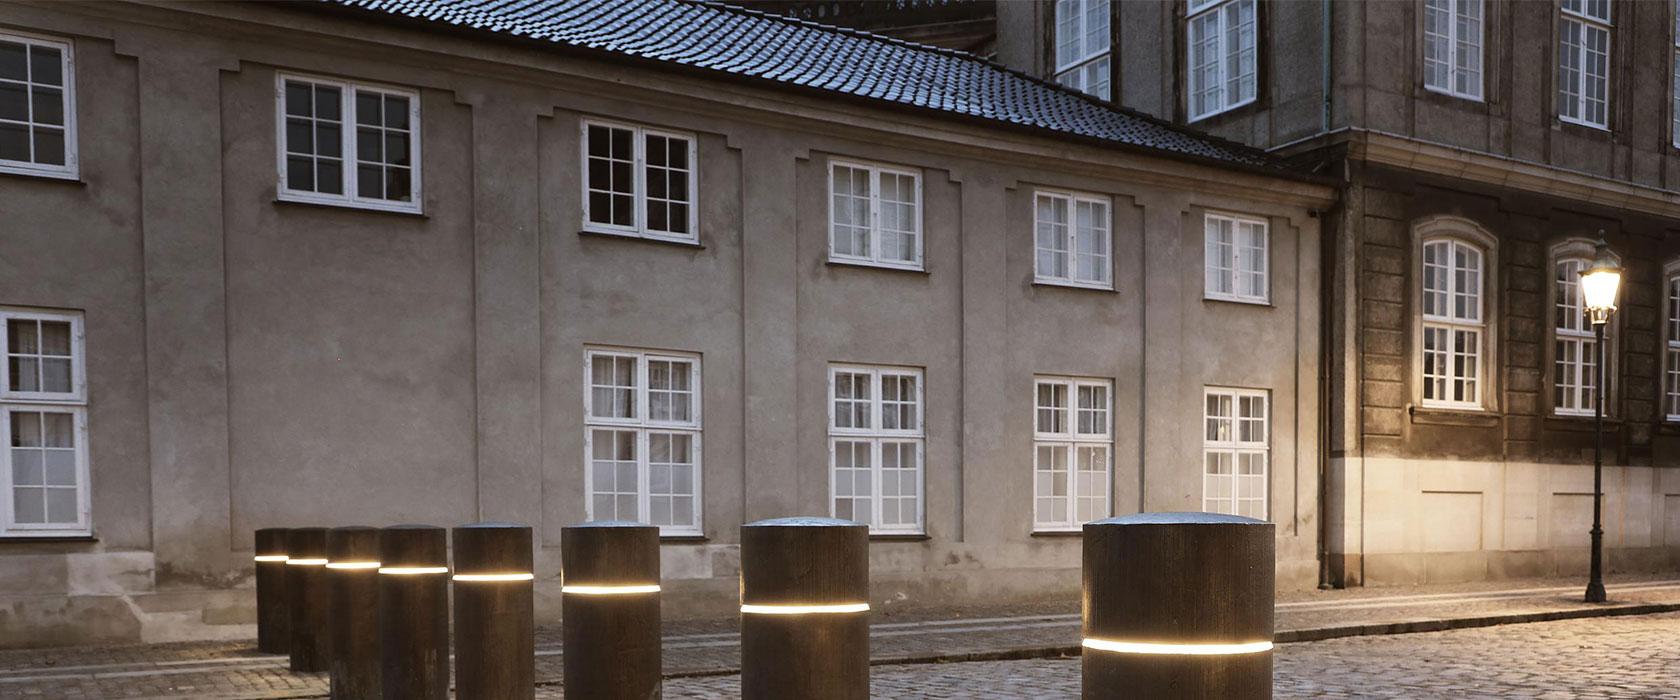 Pullerter ved Amalienborg Slotsplads